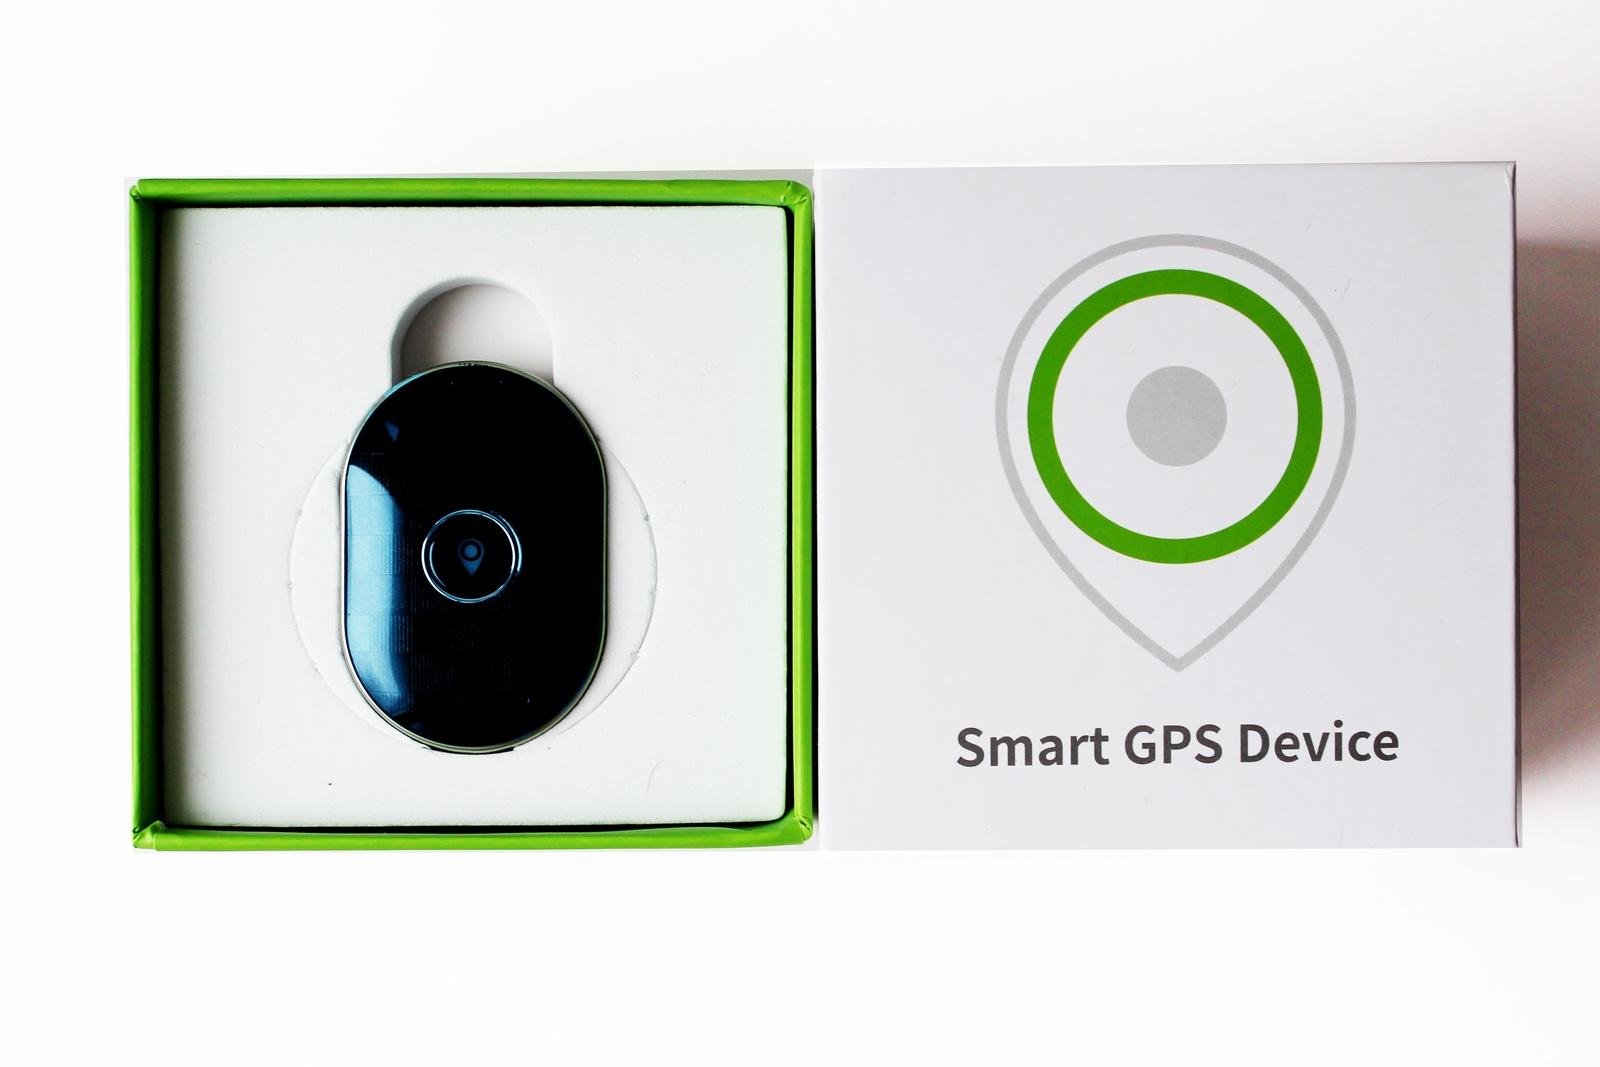 GPS-трекер ТОТЕМ GPS трекер Q-60/3819 для животных в виде ошейника/автомобилей, синий